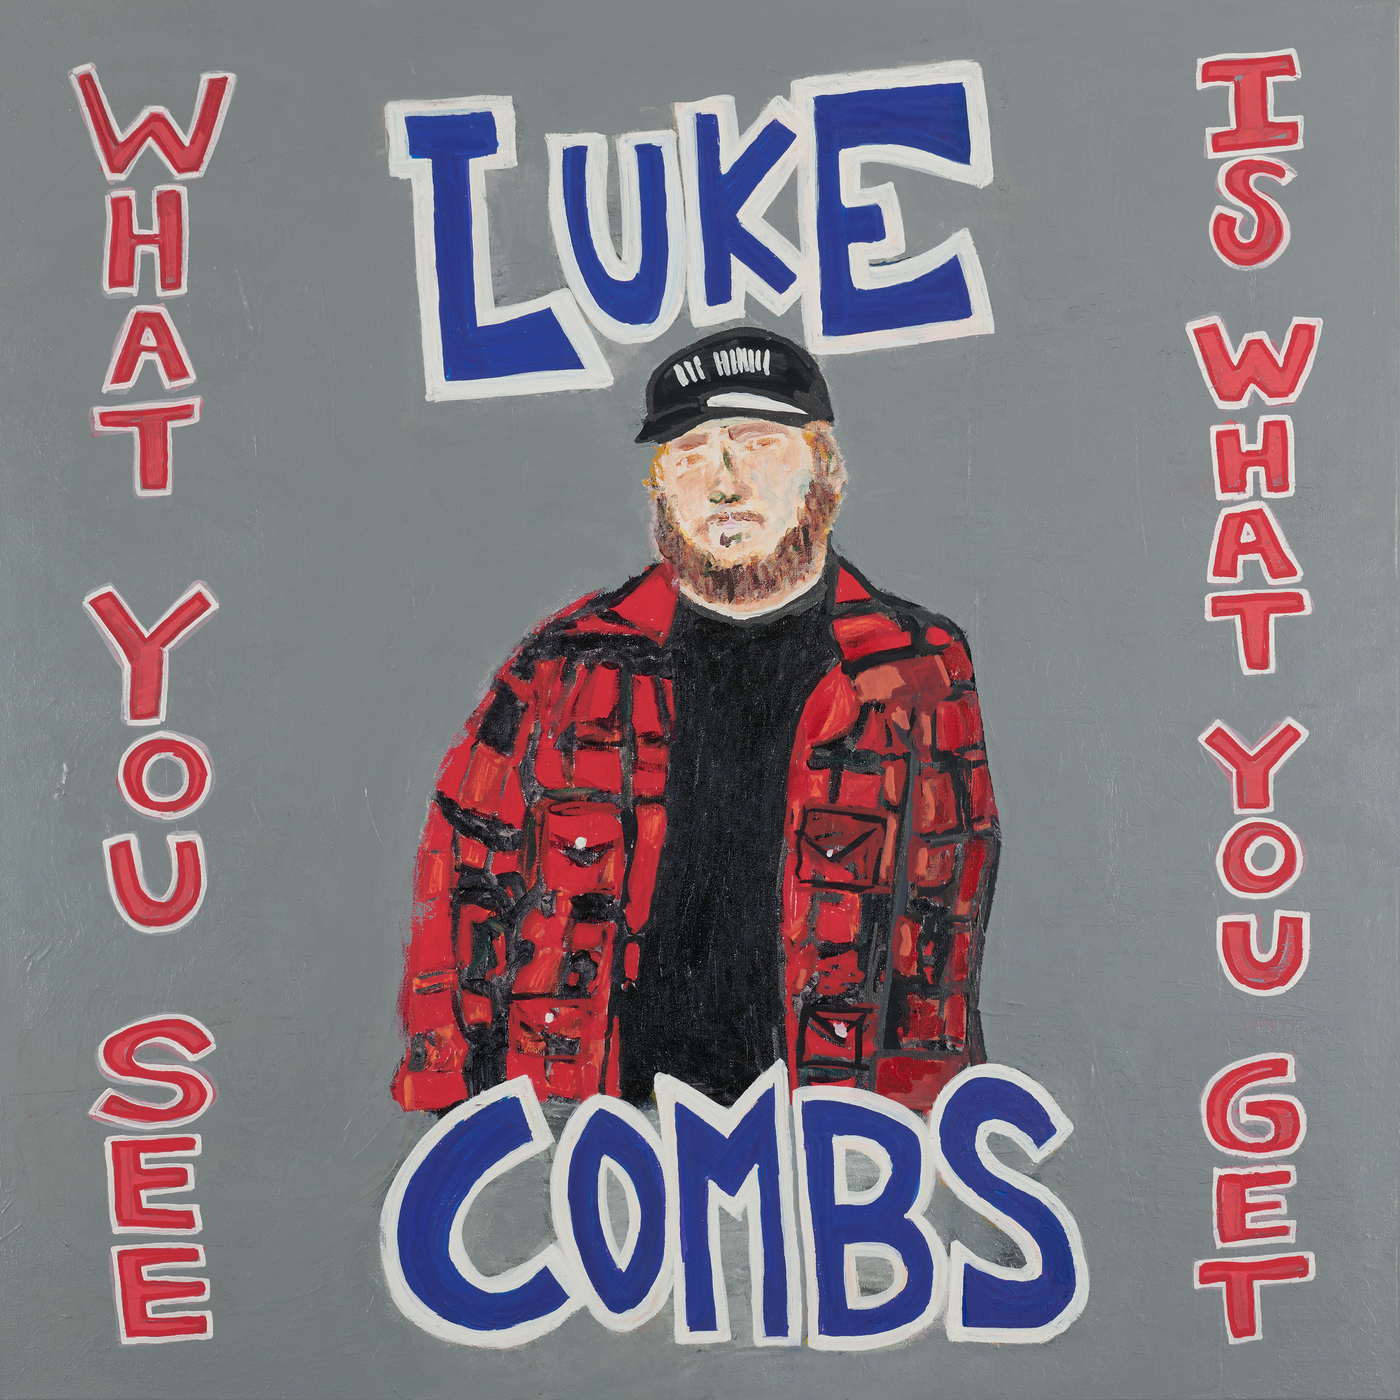 1, 2 Many - Luke Combs